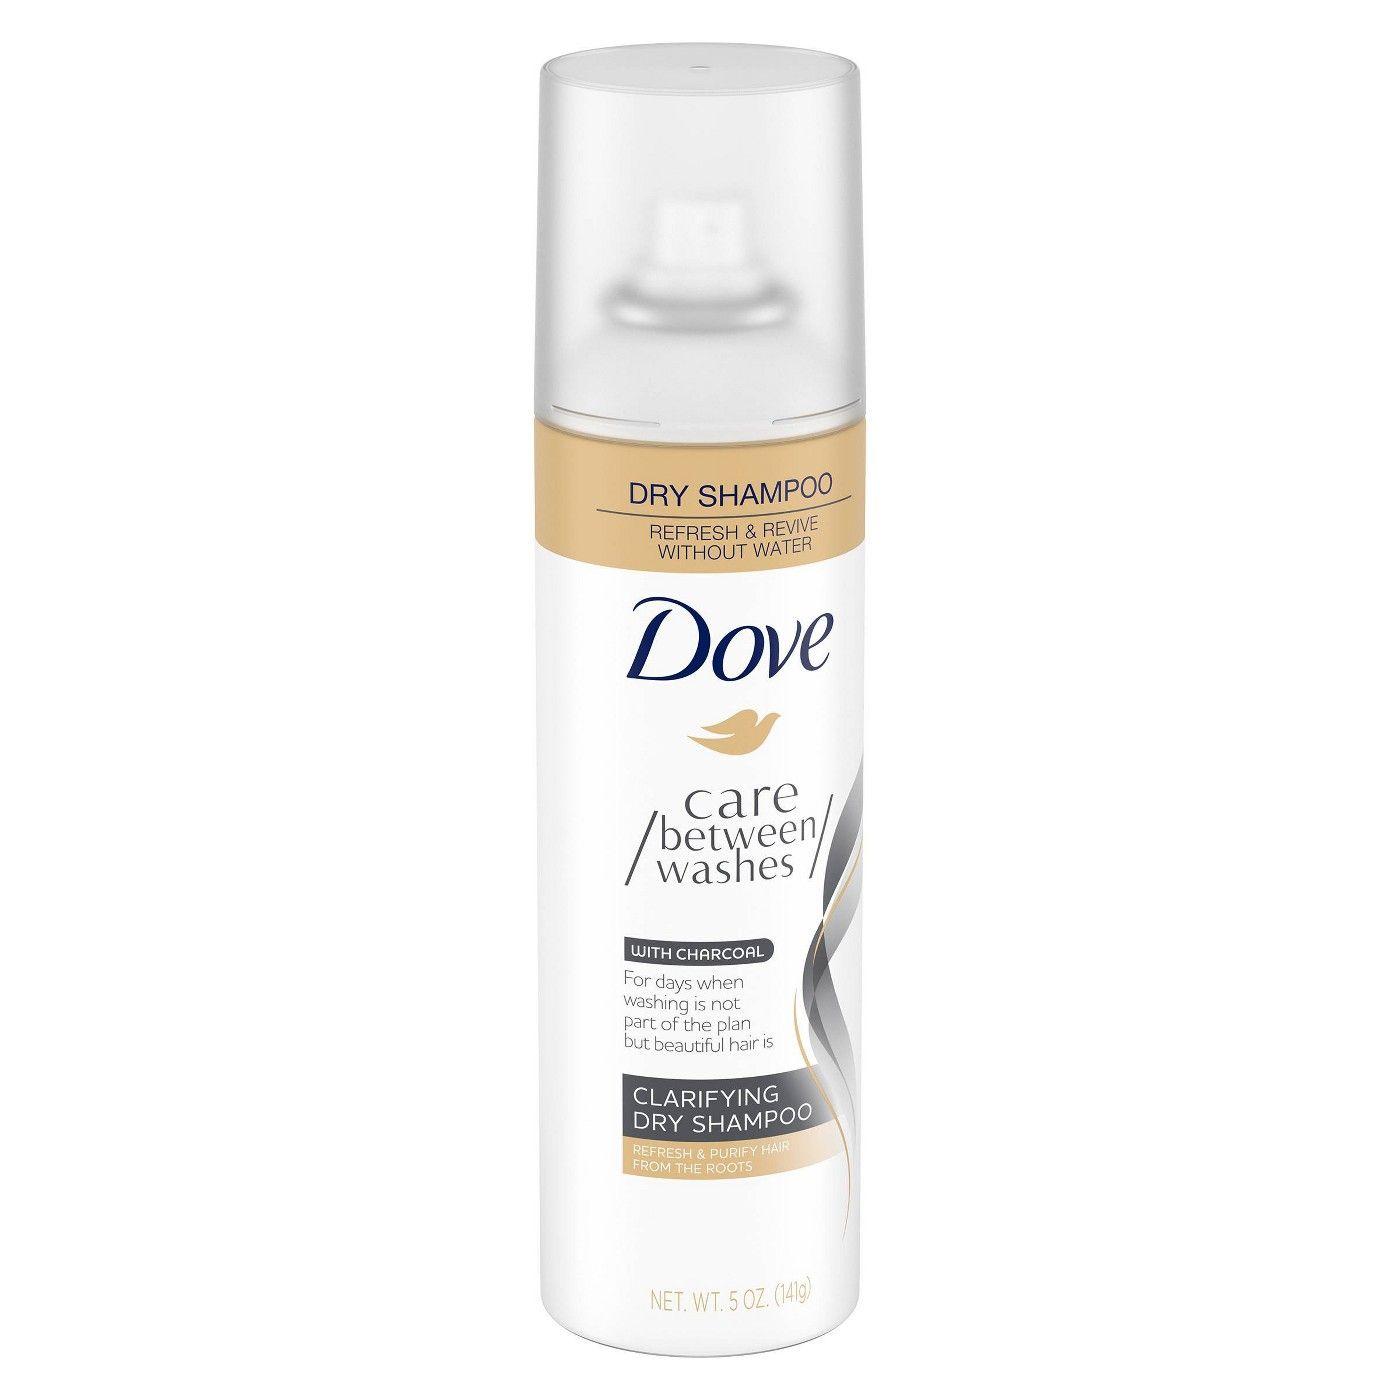 Dove Clarifying Charcoal Dry Shampoo 5oz Dry Shampoo Shampoo Dove Dry Shampoo